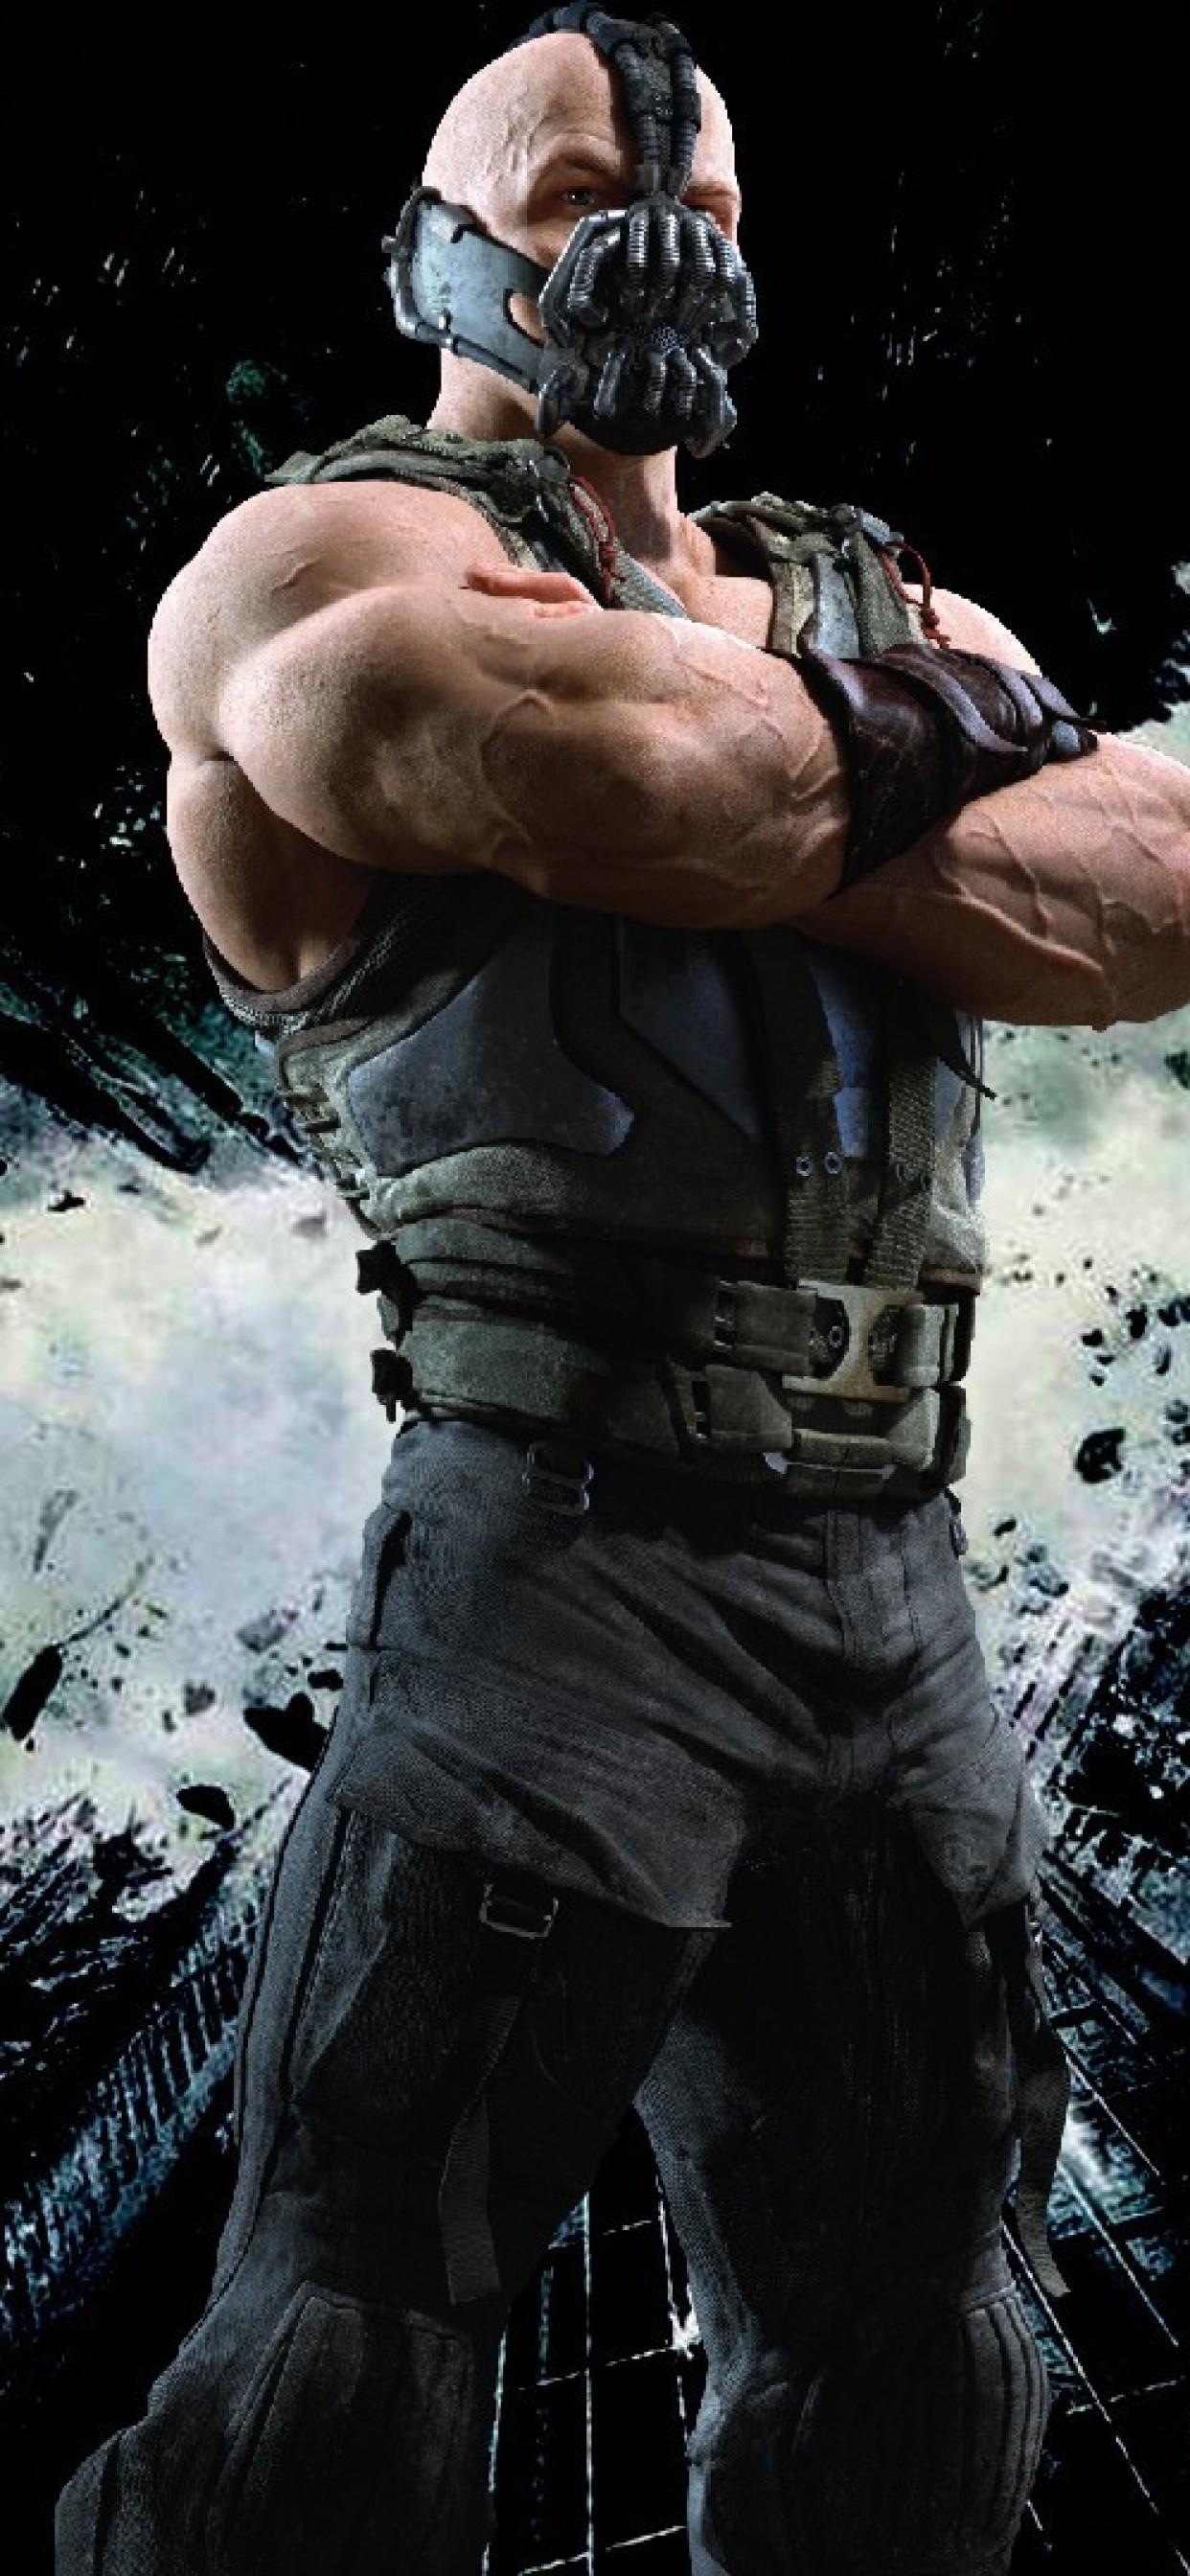 Iphone Xs Max Tom Hardy Wallpaper - Bane 2 - Dark Knight Rises , HD Wallpaper & Backgrounds